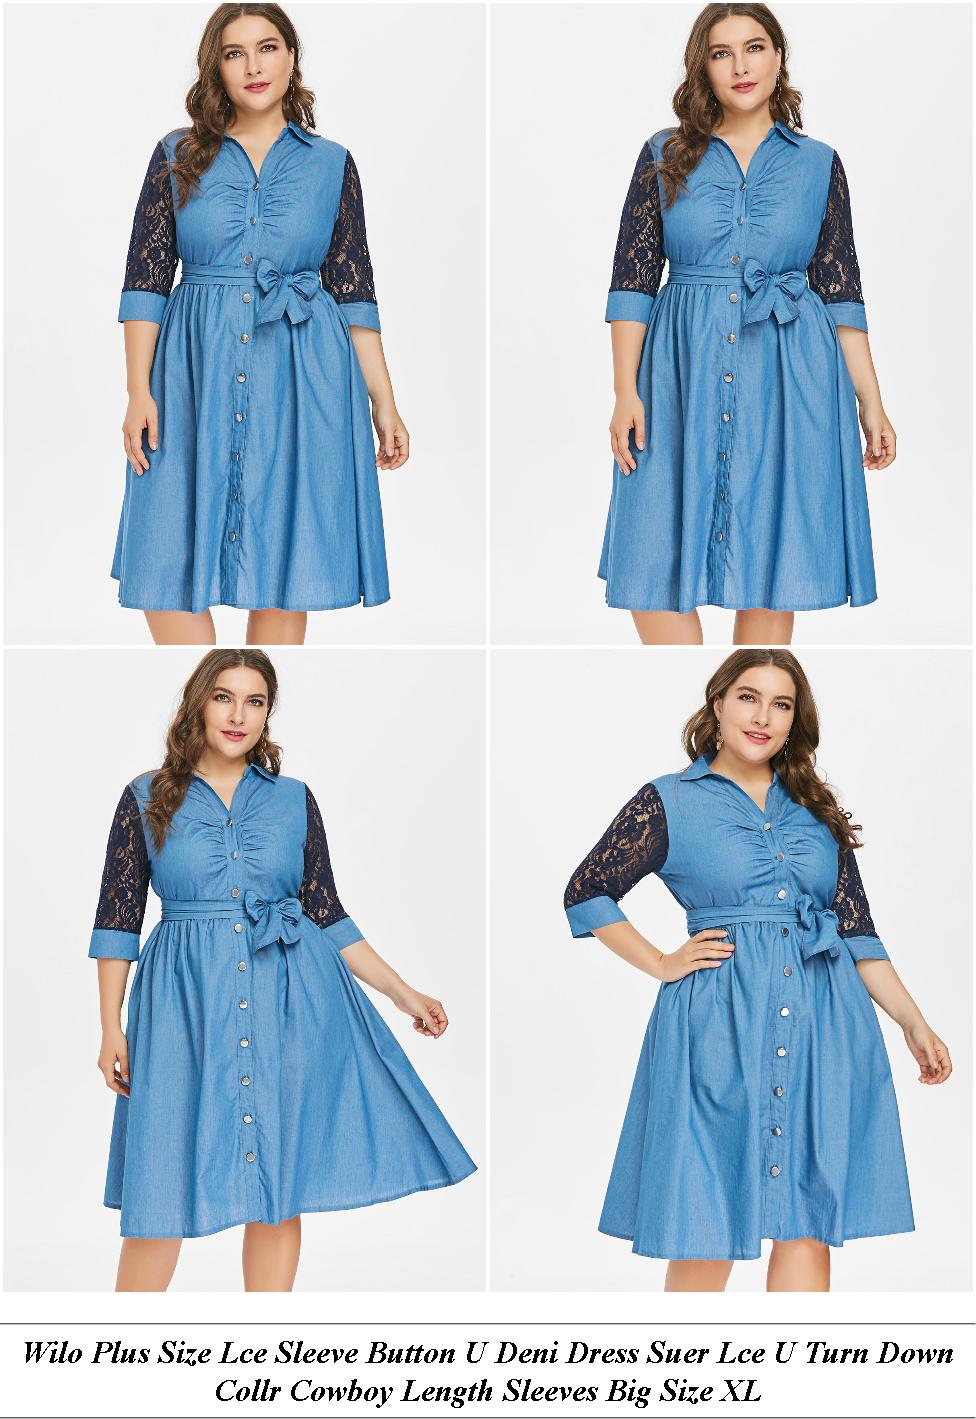 Monsoon Dresses - Us Sale - Ladies Dress - Really Cheap Clothes Online Uk